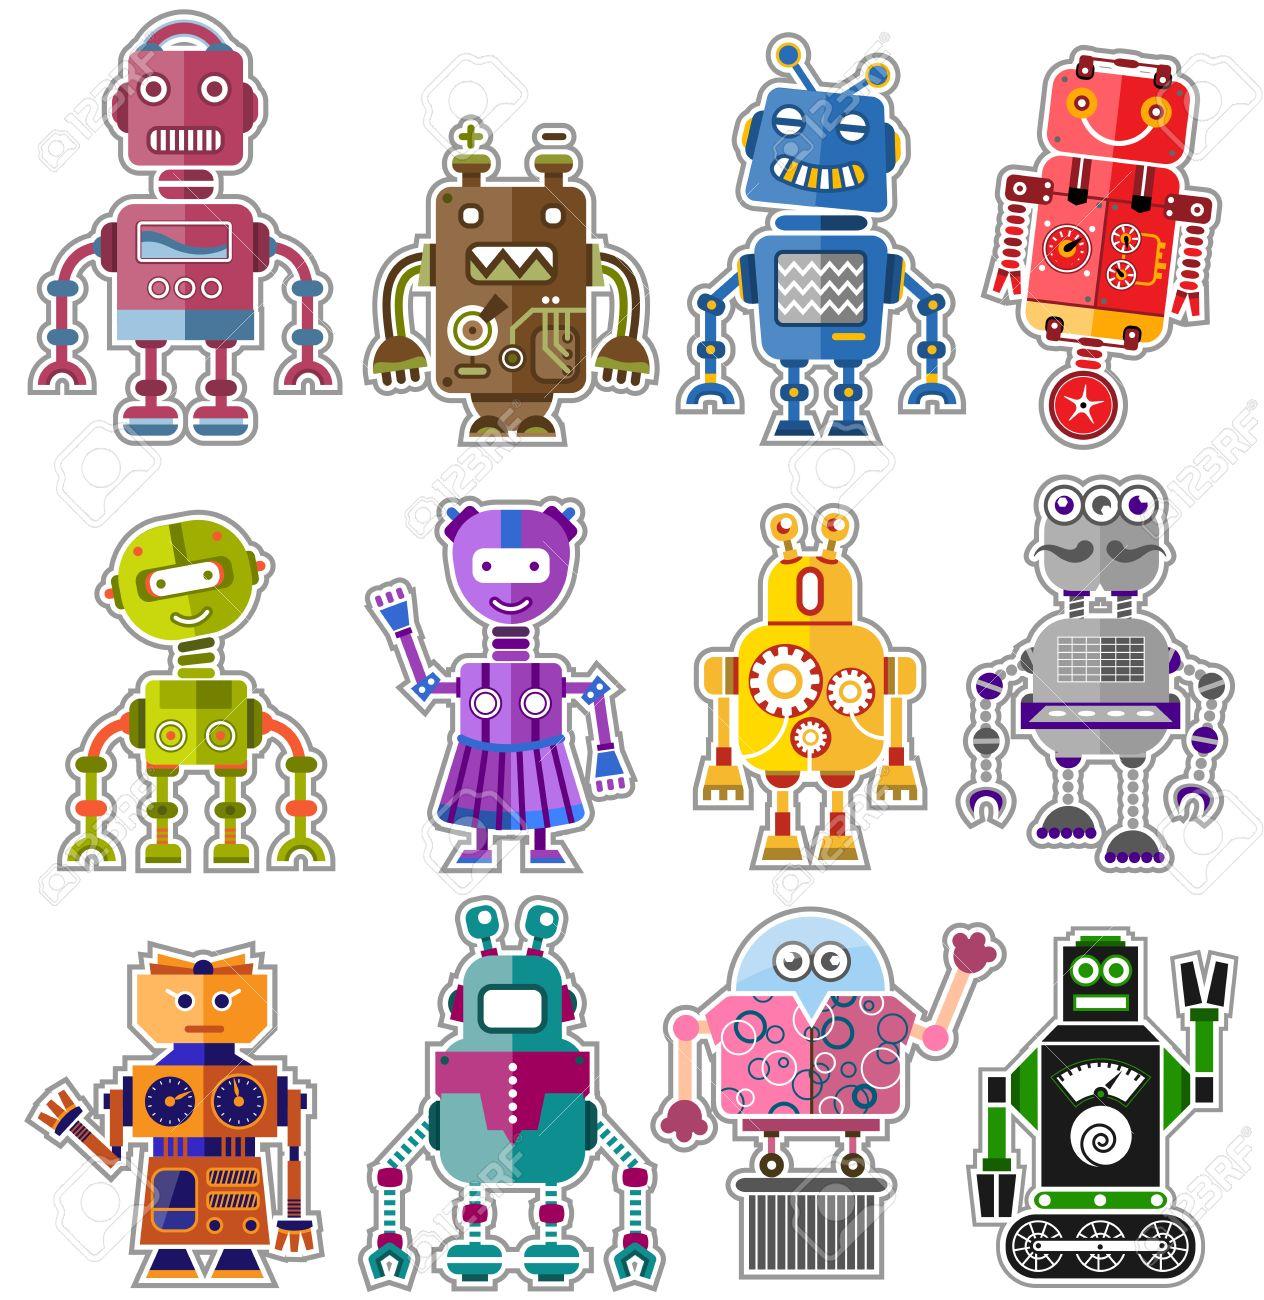 Cute Robot Icon And Cute Robots Robot